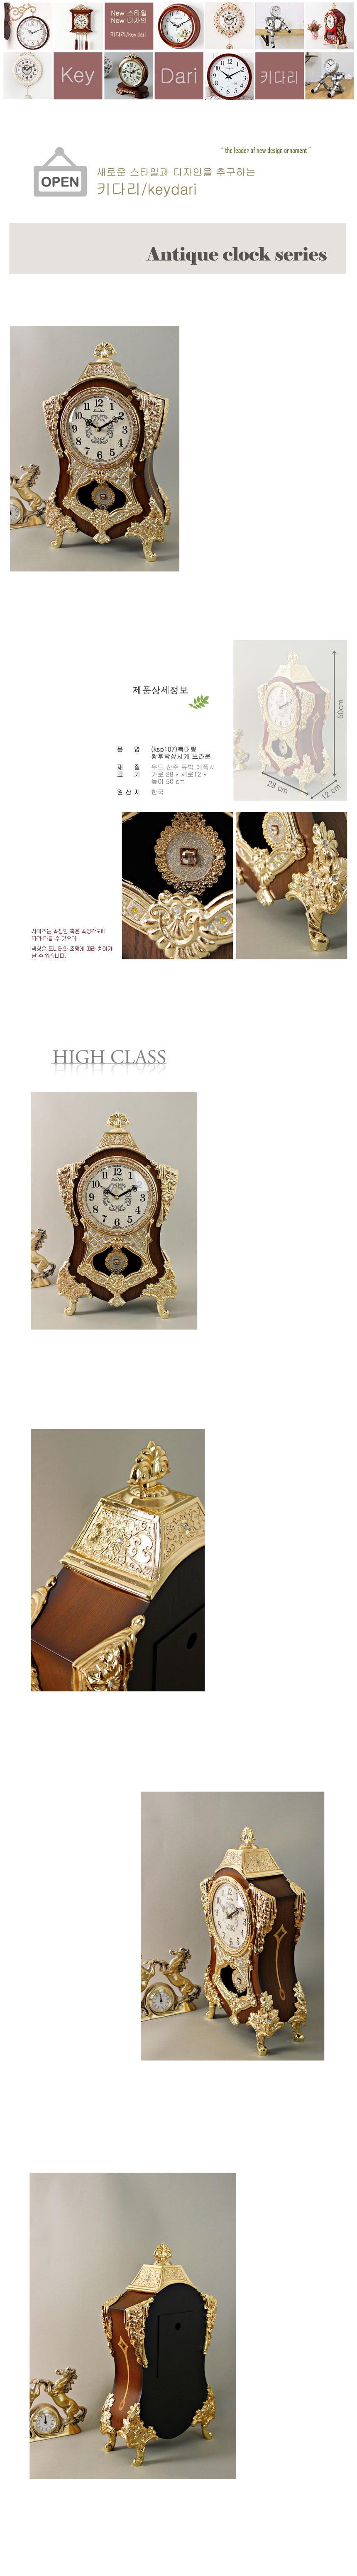 (ksp107)로얄퀸탁상 브라운 (특대형) - 키다리, 290,000원, 알람/탁상시계, 앤틱시계